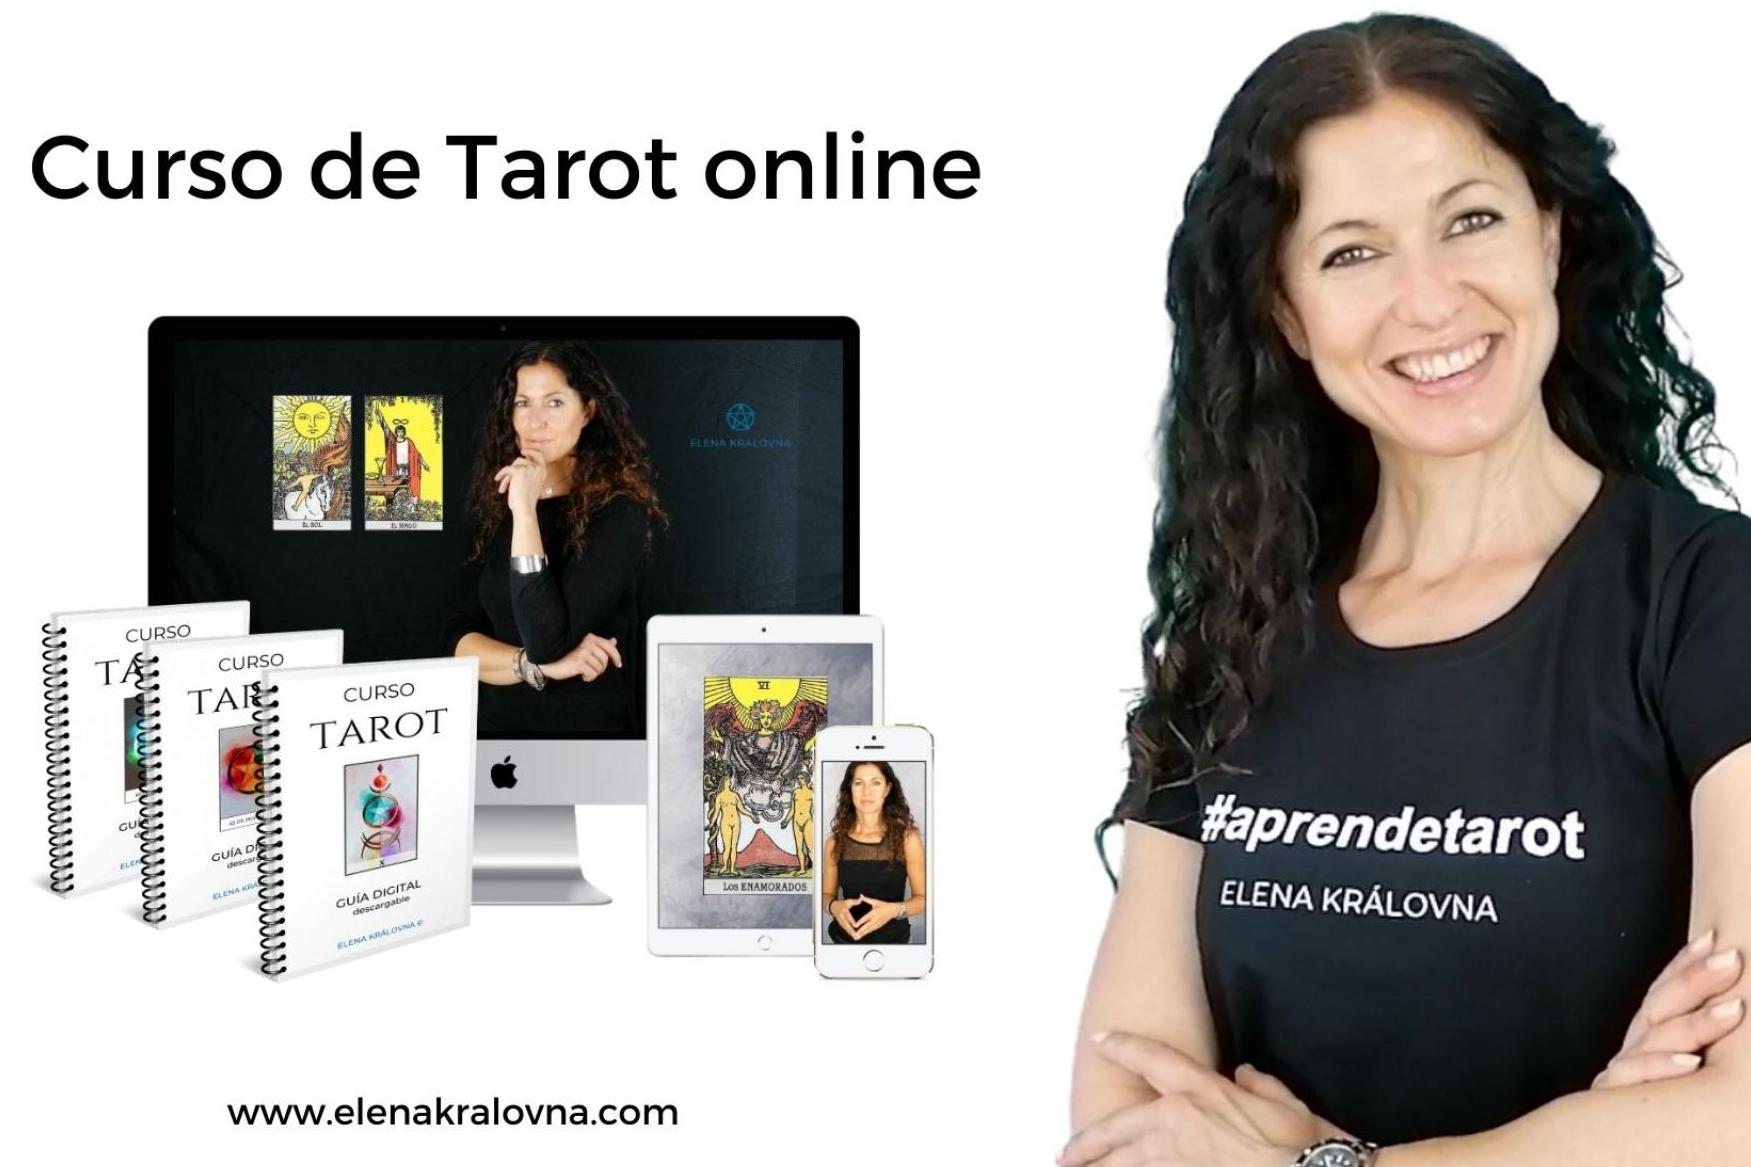 Curso online completo de Tarot: Elena Kralovna